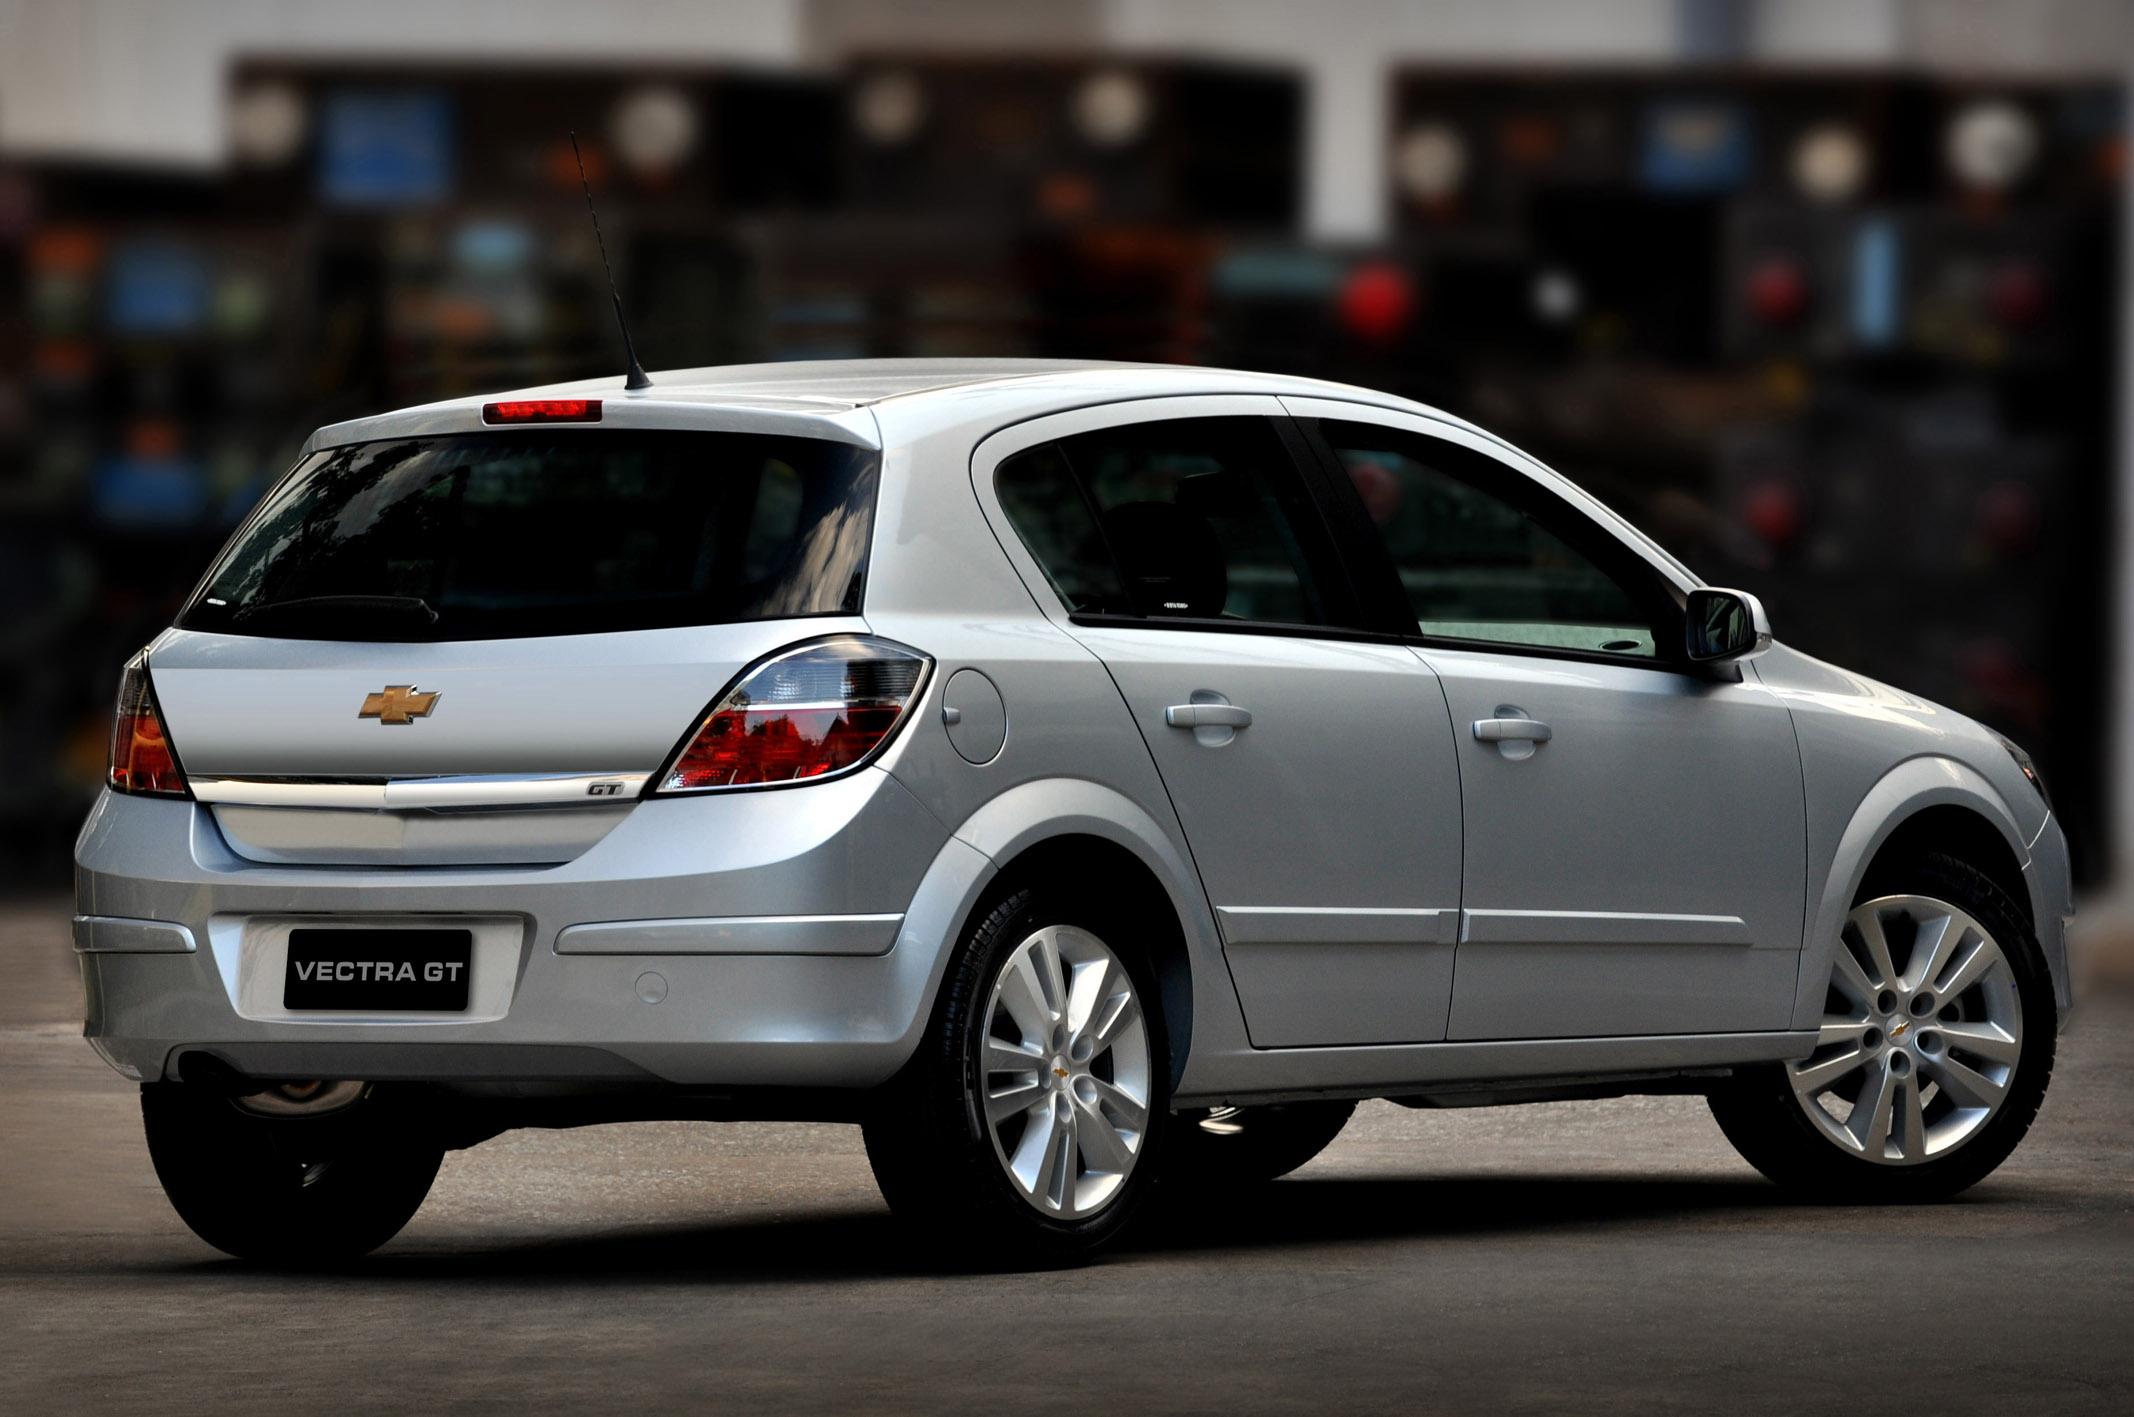 Chevrolet Vectra 2014 foto - 2